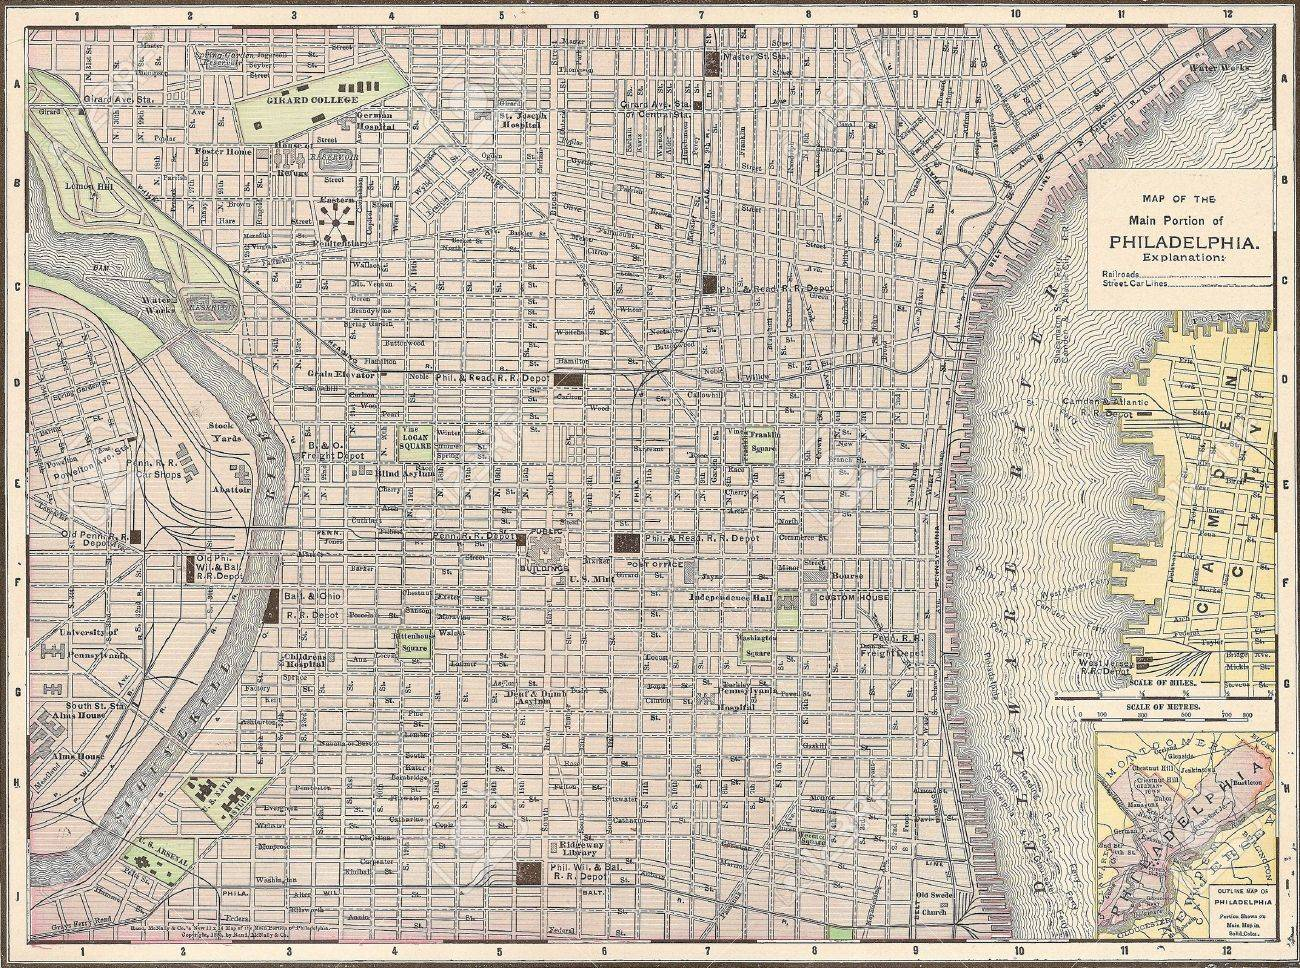 Vintage Philadelphia Map Vintage 1891 Map Of The City Of Philadelphia, Pennsylvania; Out